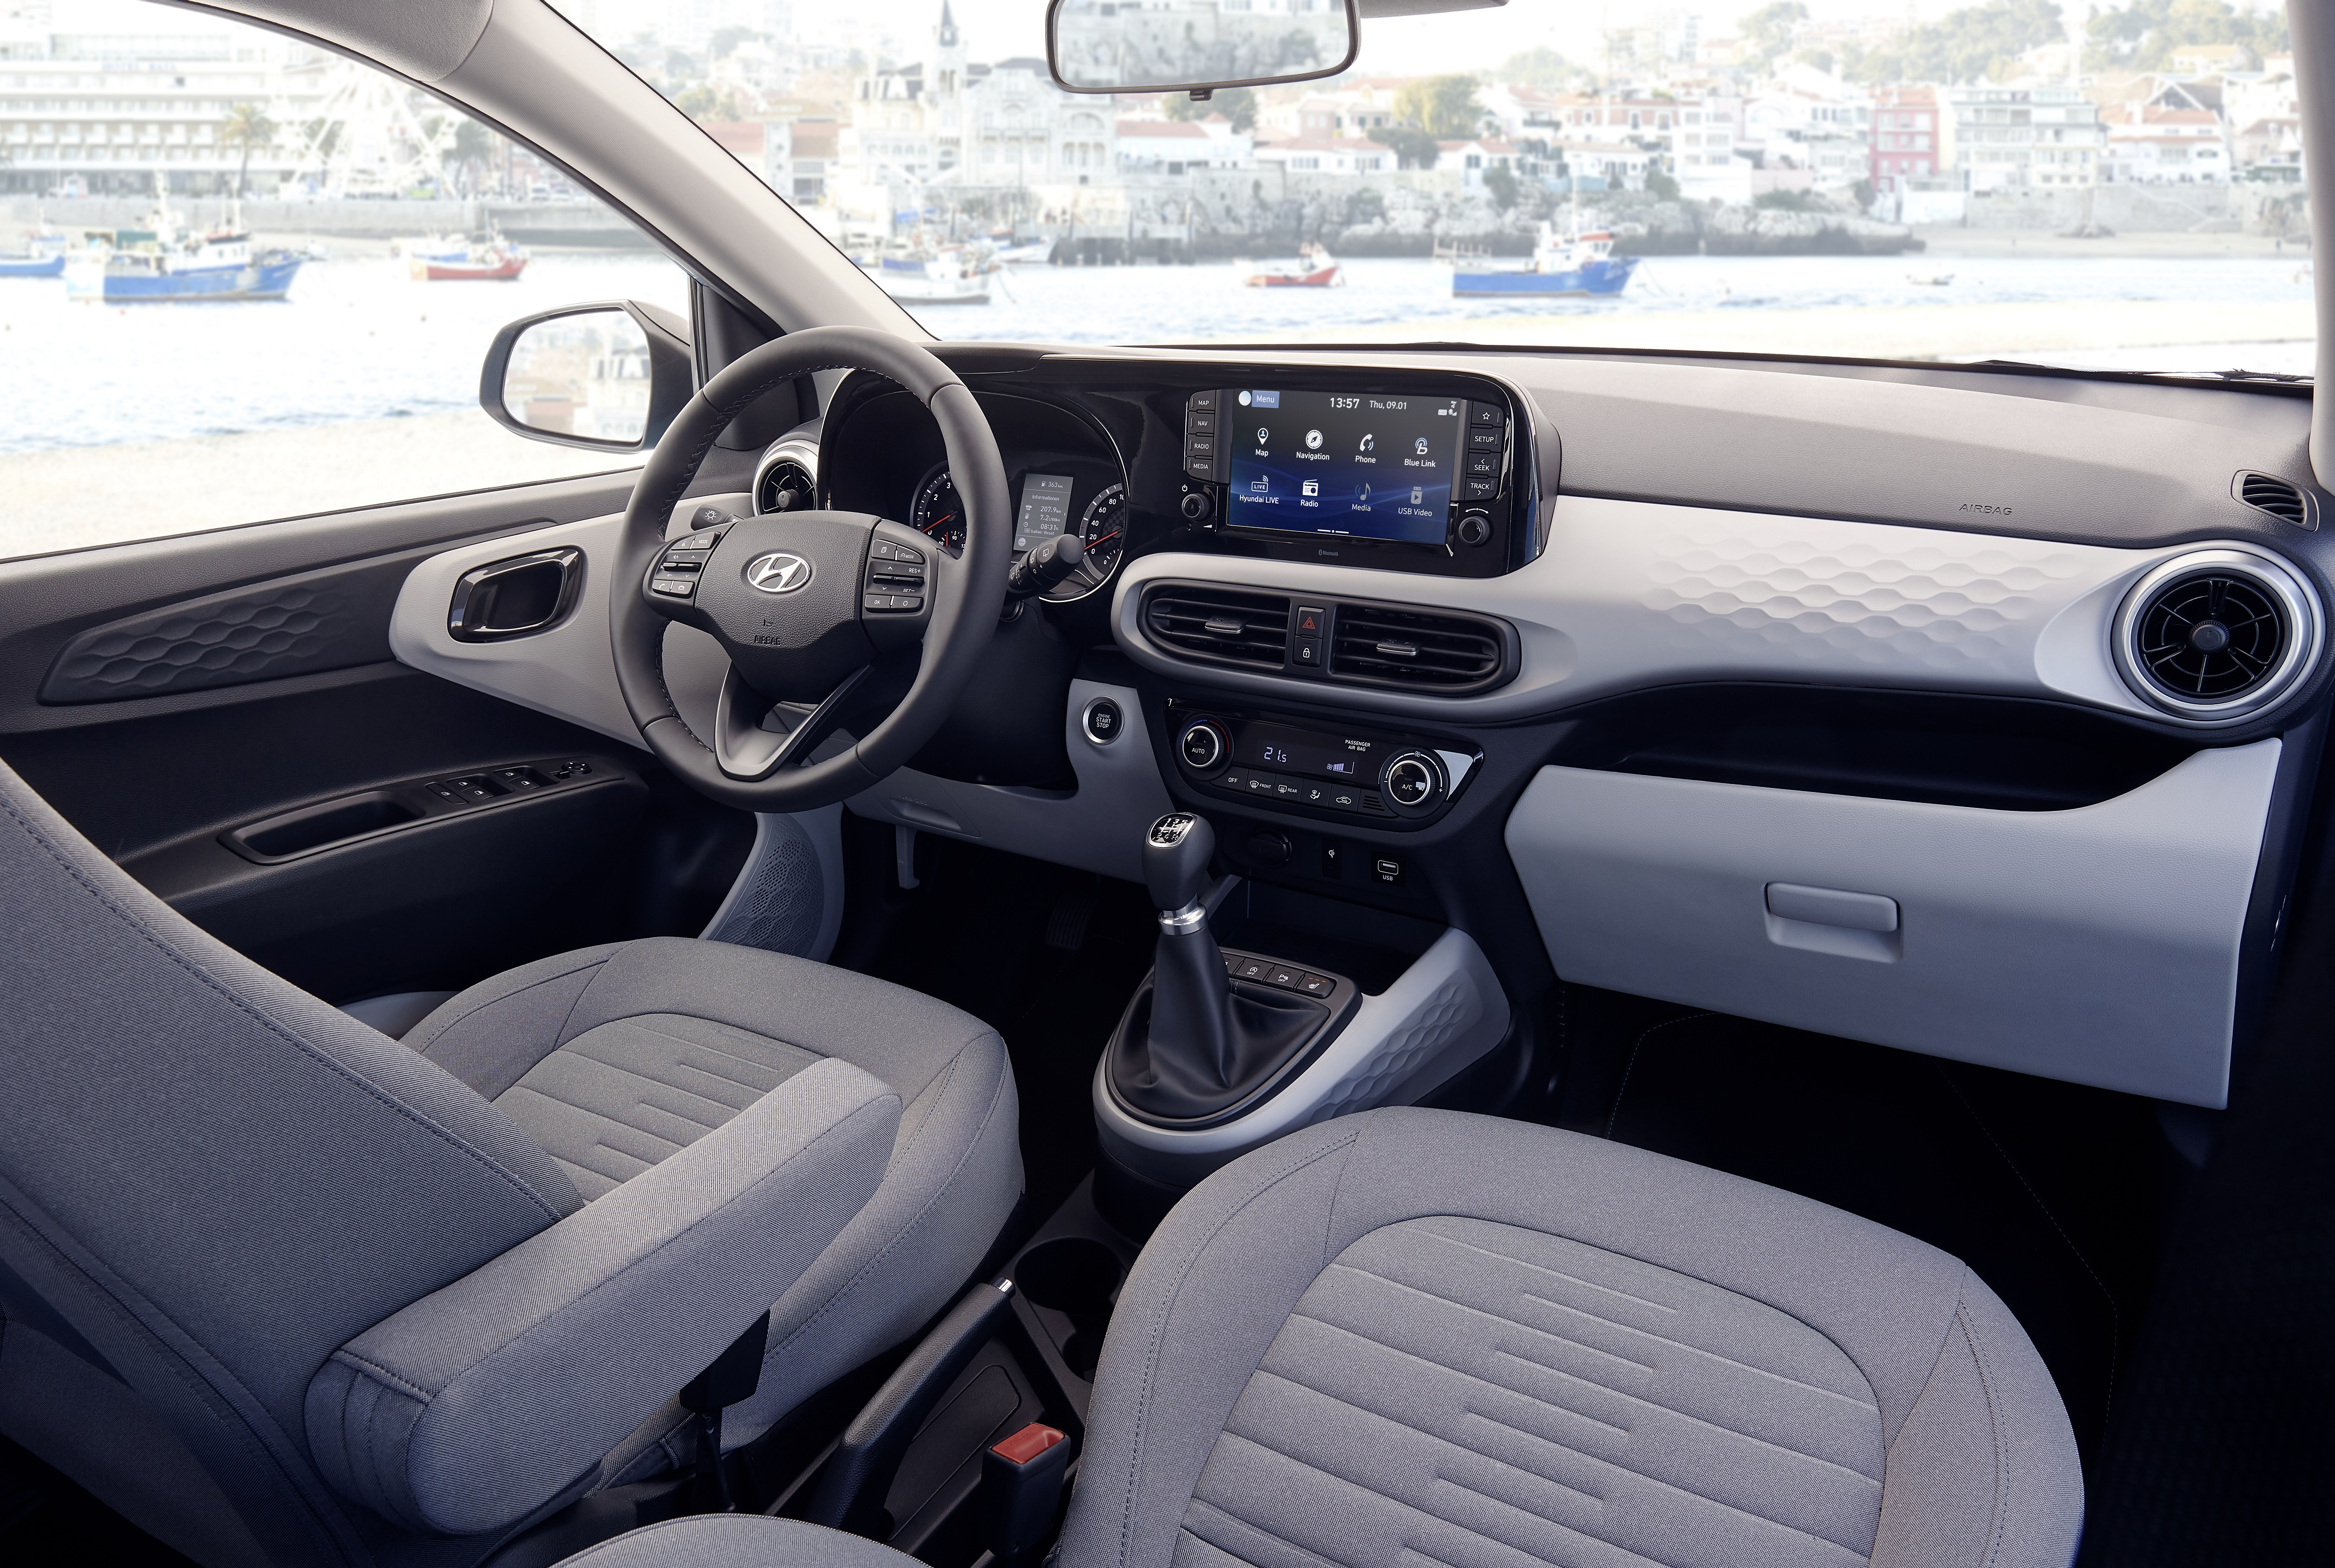 Hyundai i10 interior (1)